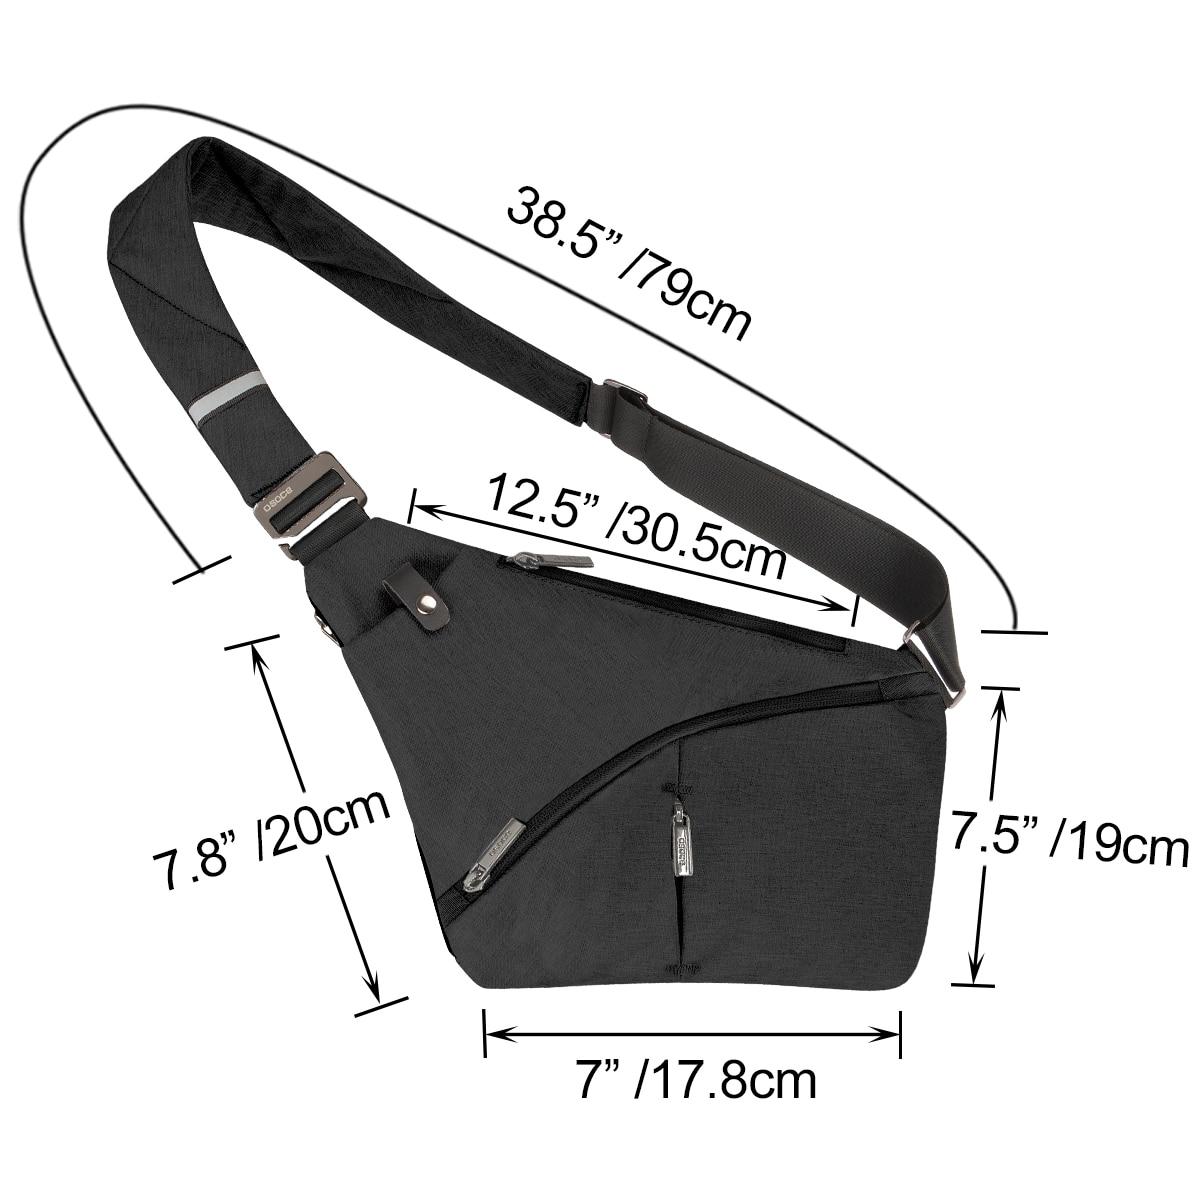 Anti-Theft Crossbody Bag Shoulder Bag Sling Chest bag Waterproof Cover Pack Rucksack Bicycle Sport 5